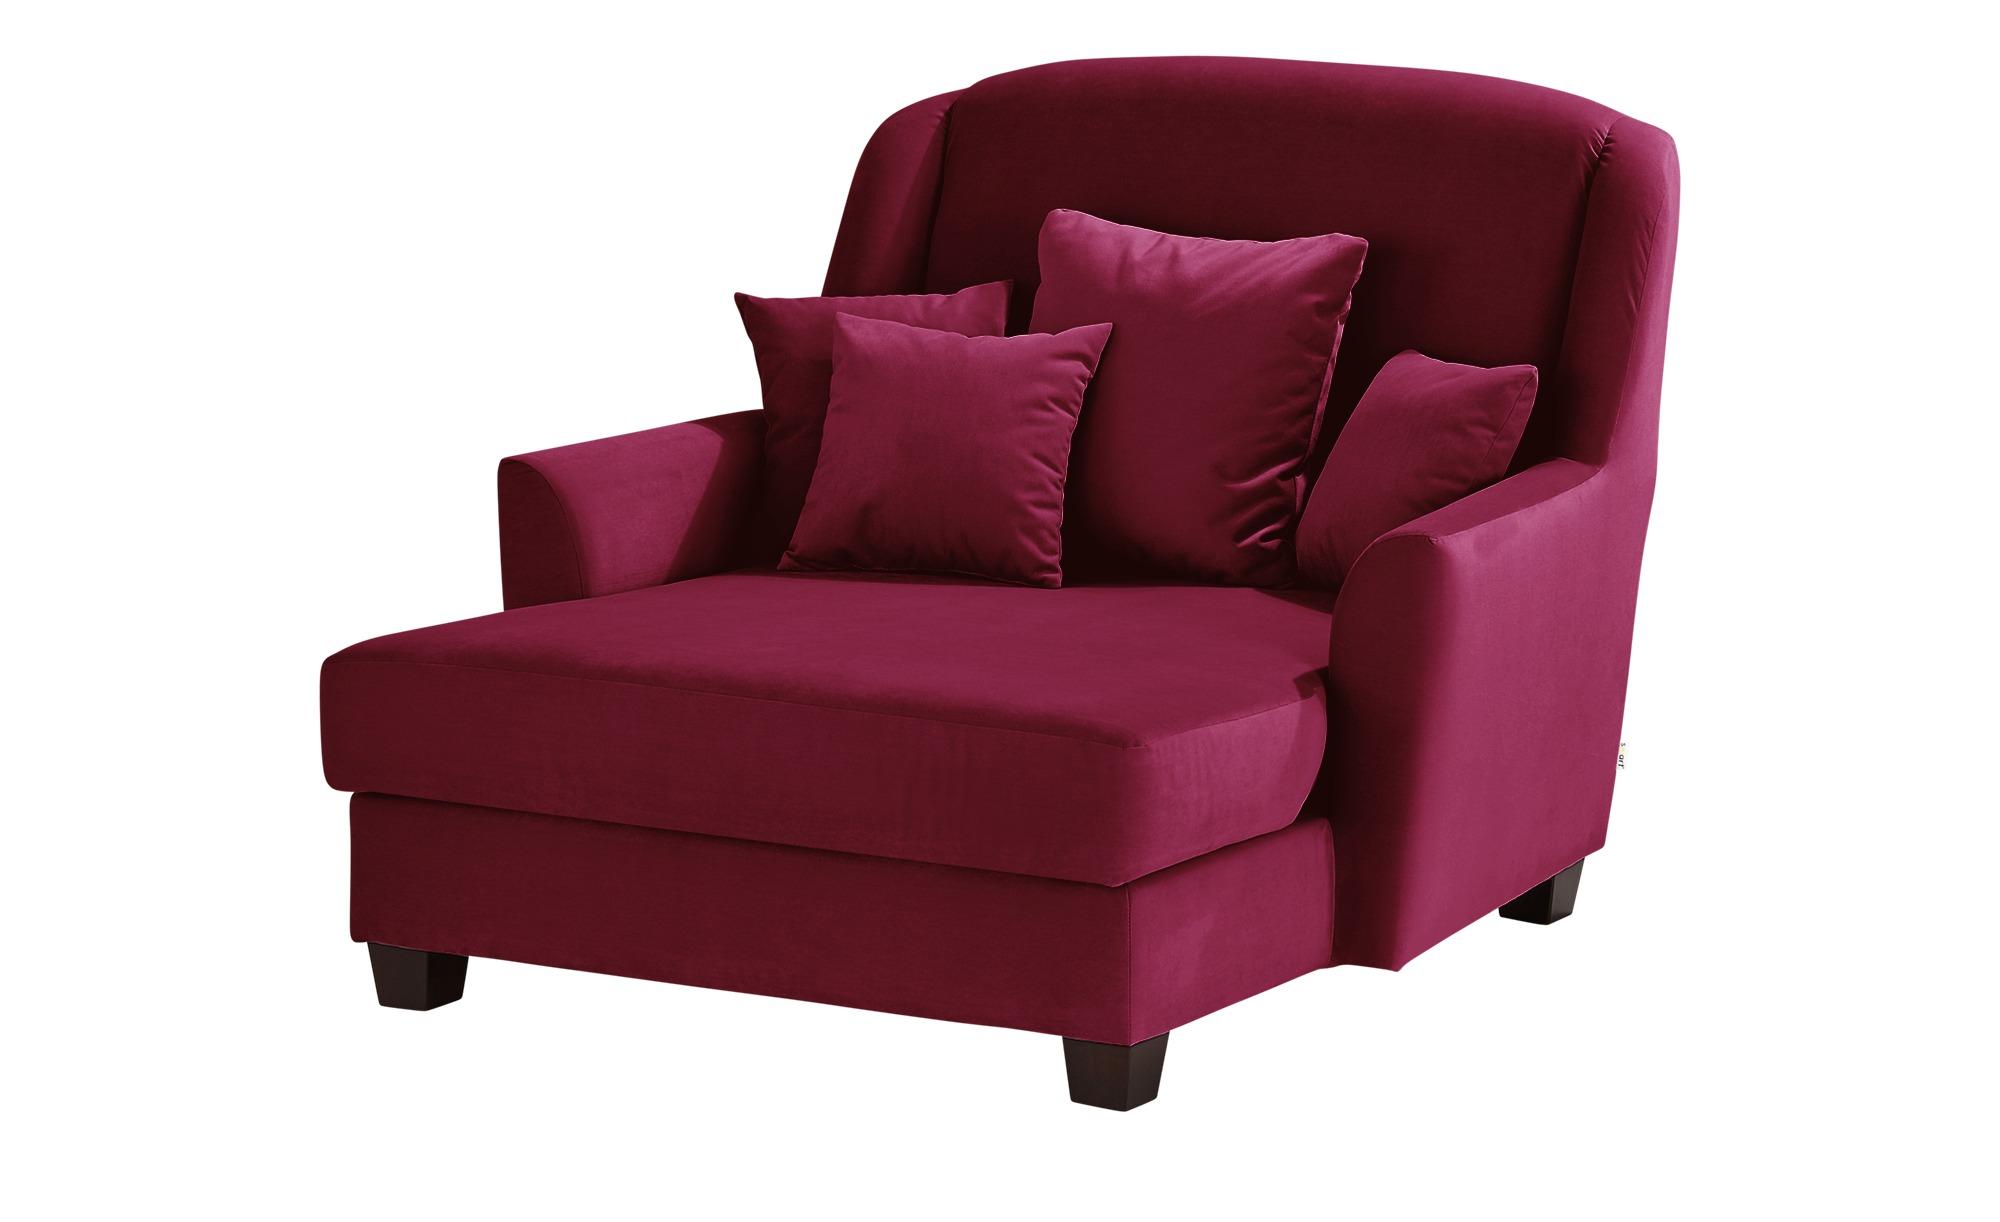 smart Sessel  Lisbeth ¦ rot ¦ Maße (cm): B: 135 H: 100 T: 144 Polstermöbel > Sessel > Ohrensessel - Höffner